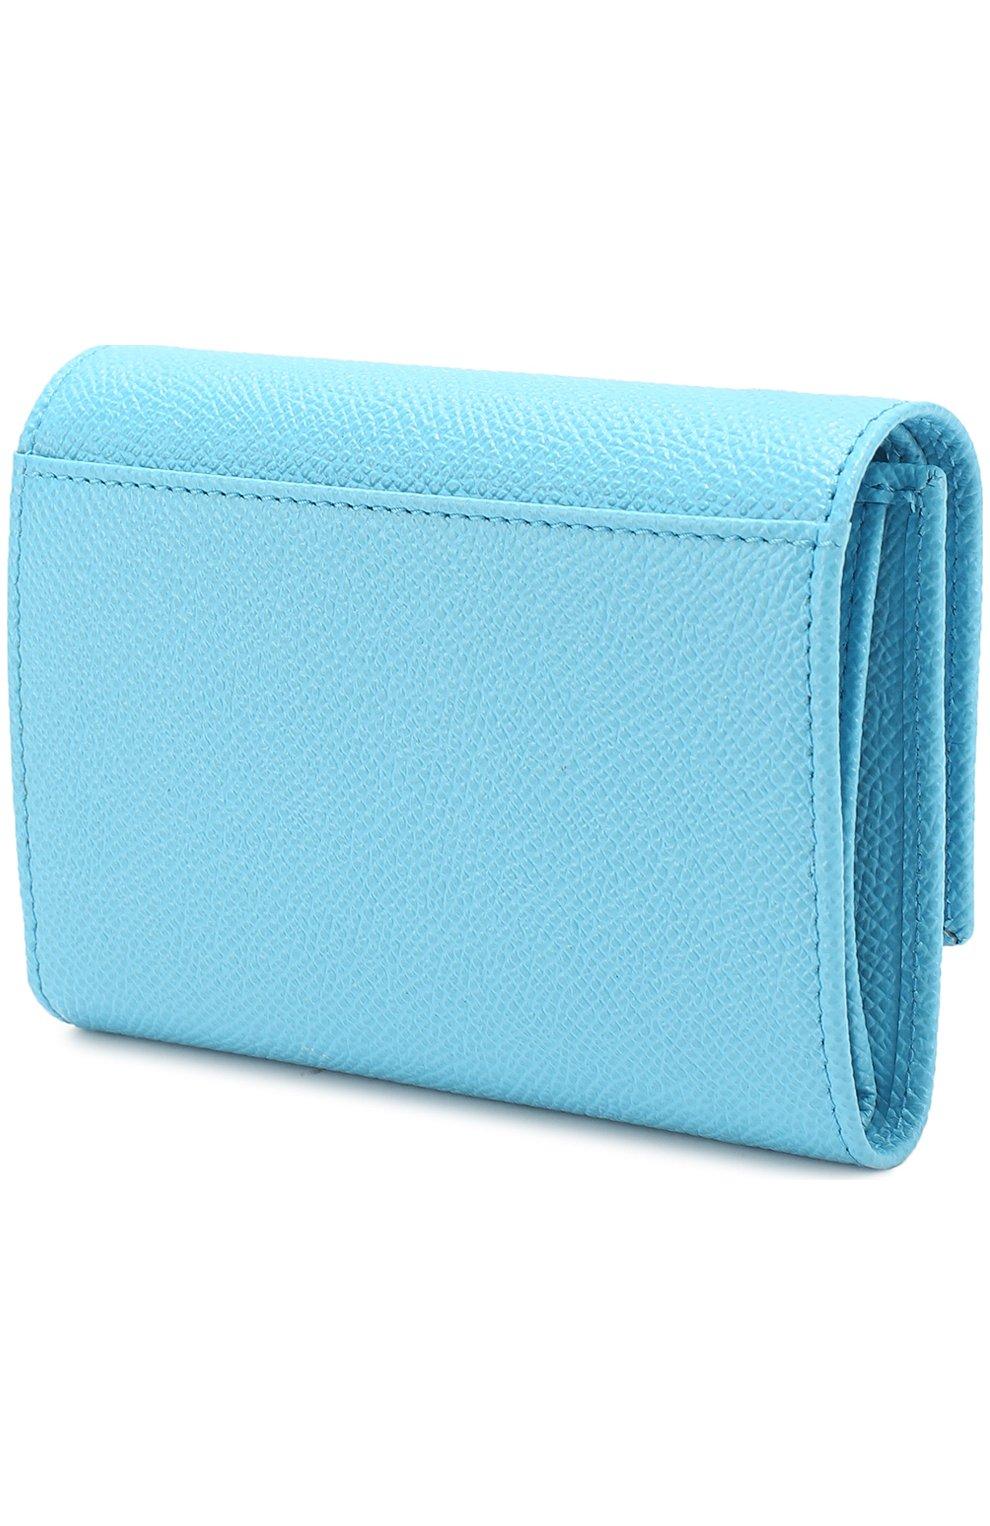 Кожаное портмоне Dolce & Gabbana голубого цвета | Фото №2